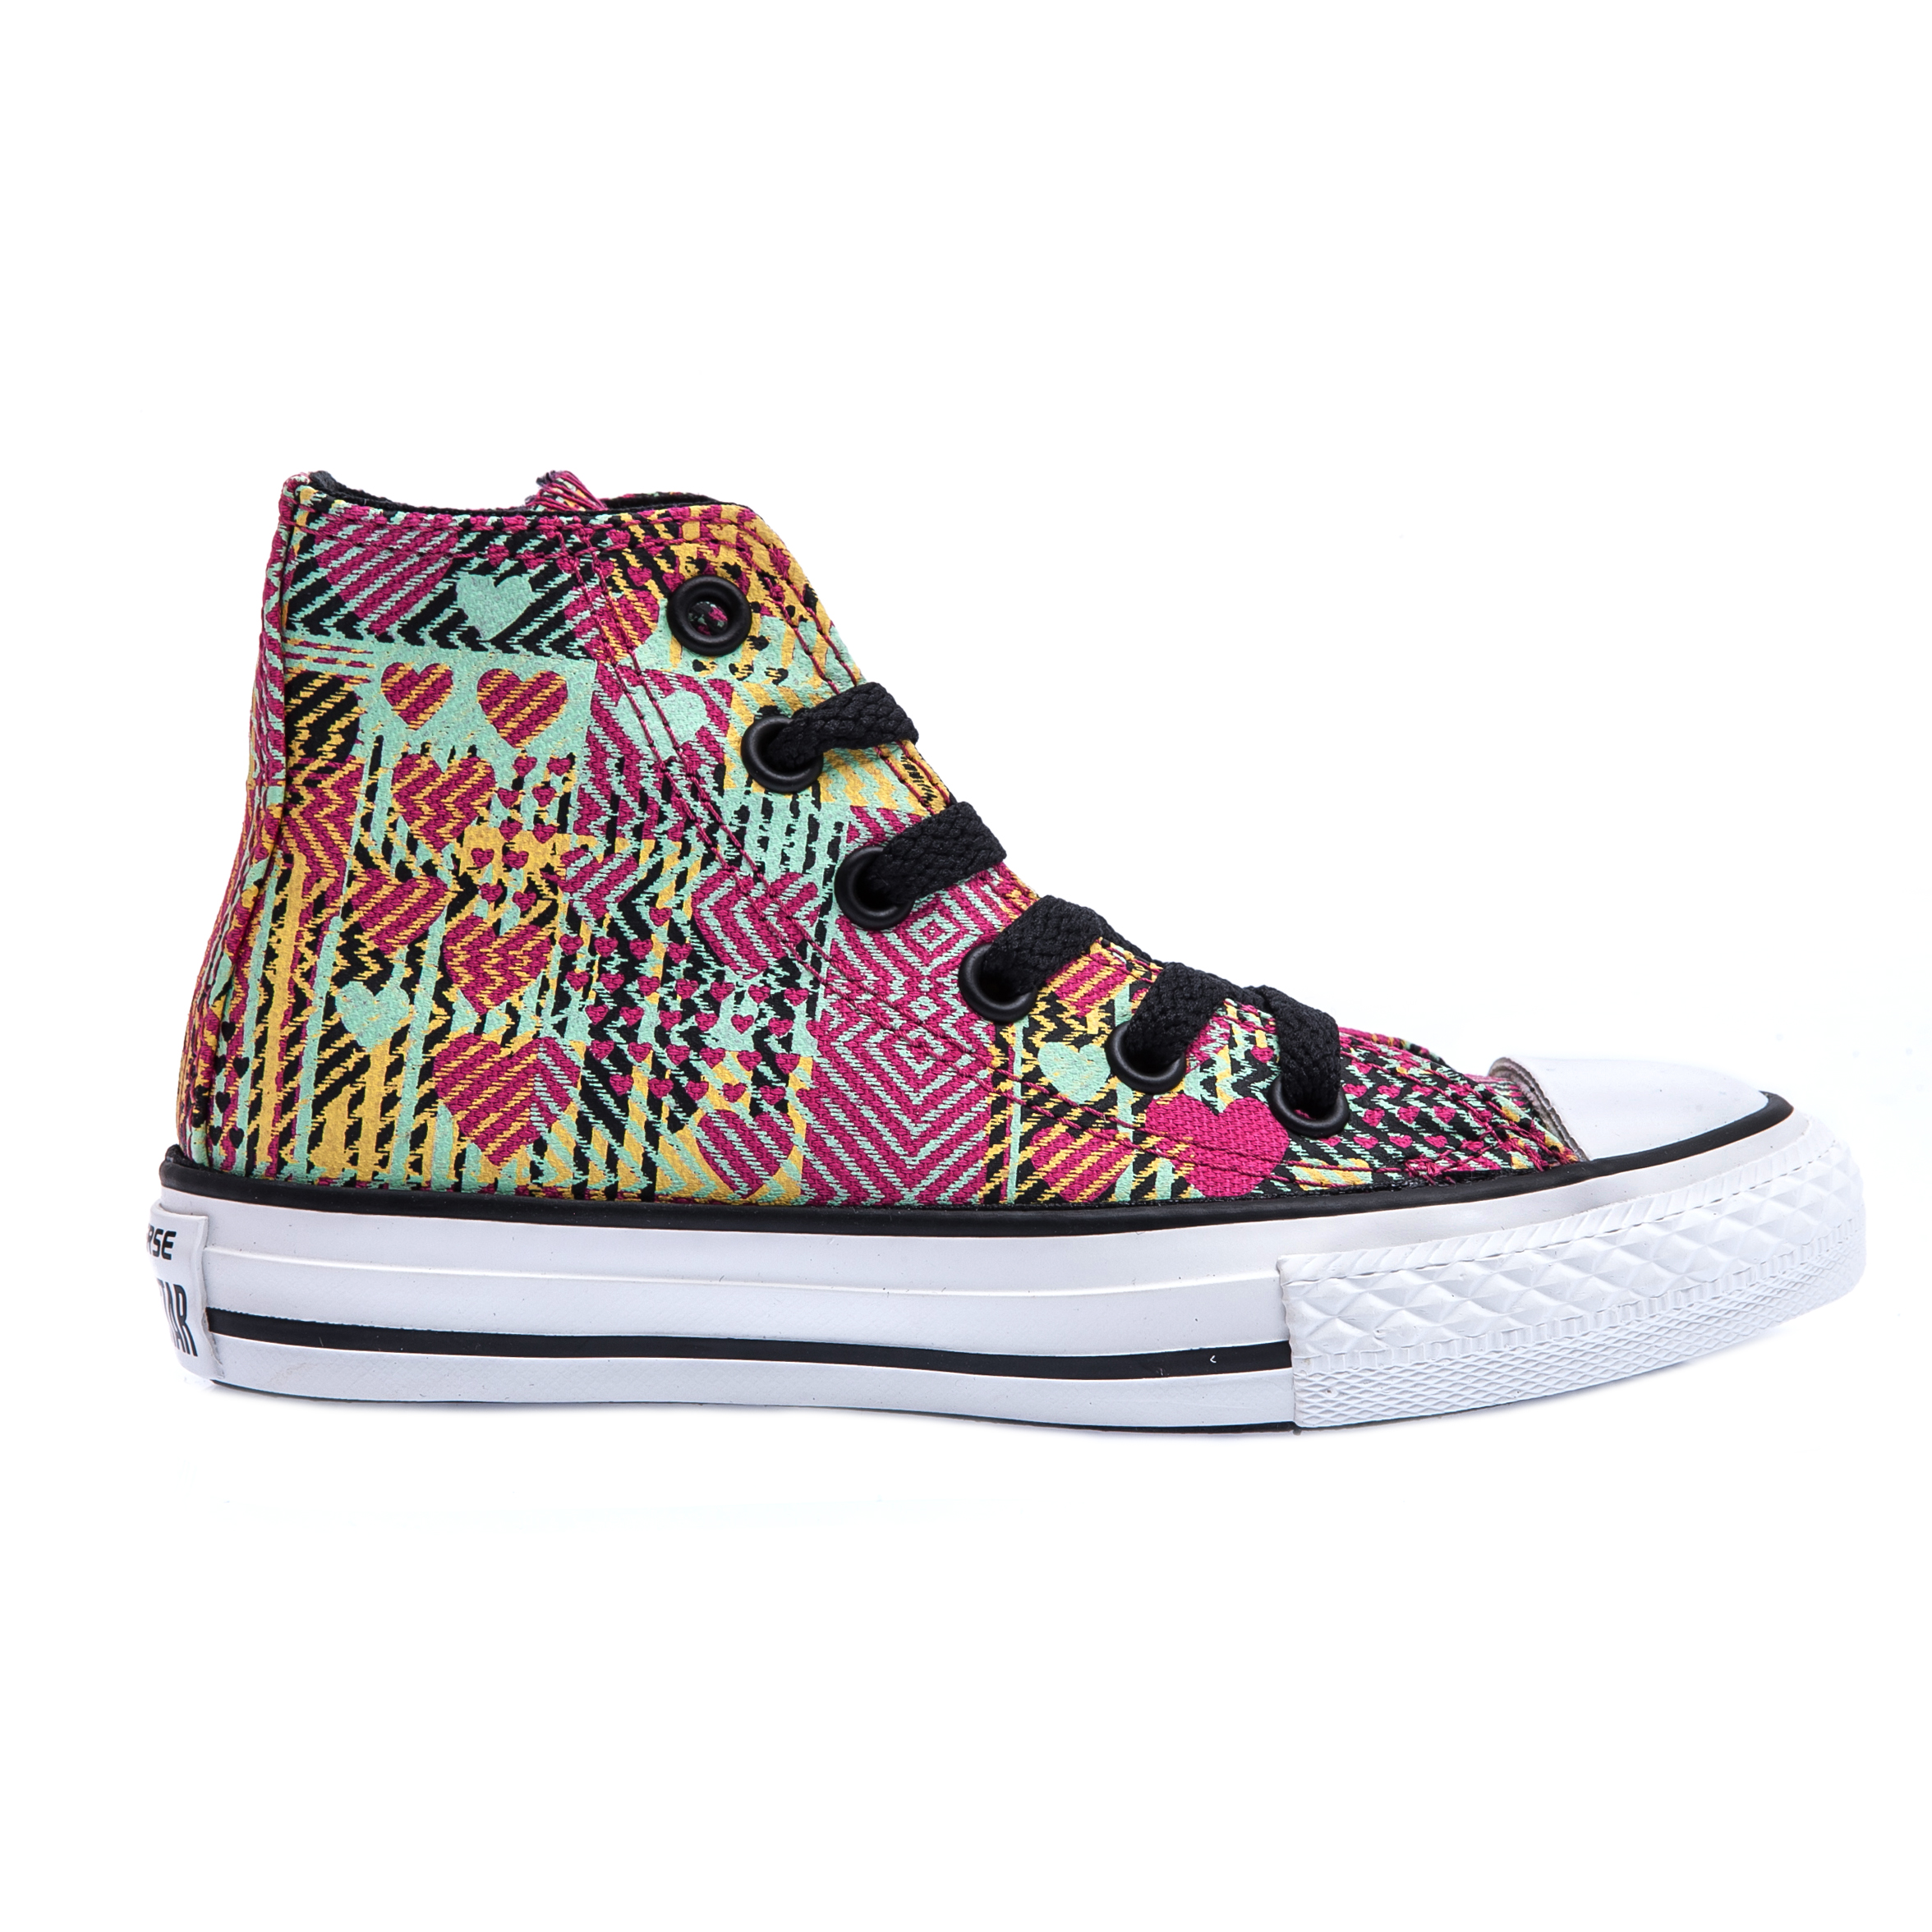 551421f5f1c CONVERSE - Παιδικά παπούτσια Chuck Taylor εμπριμέ